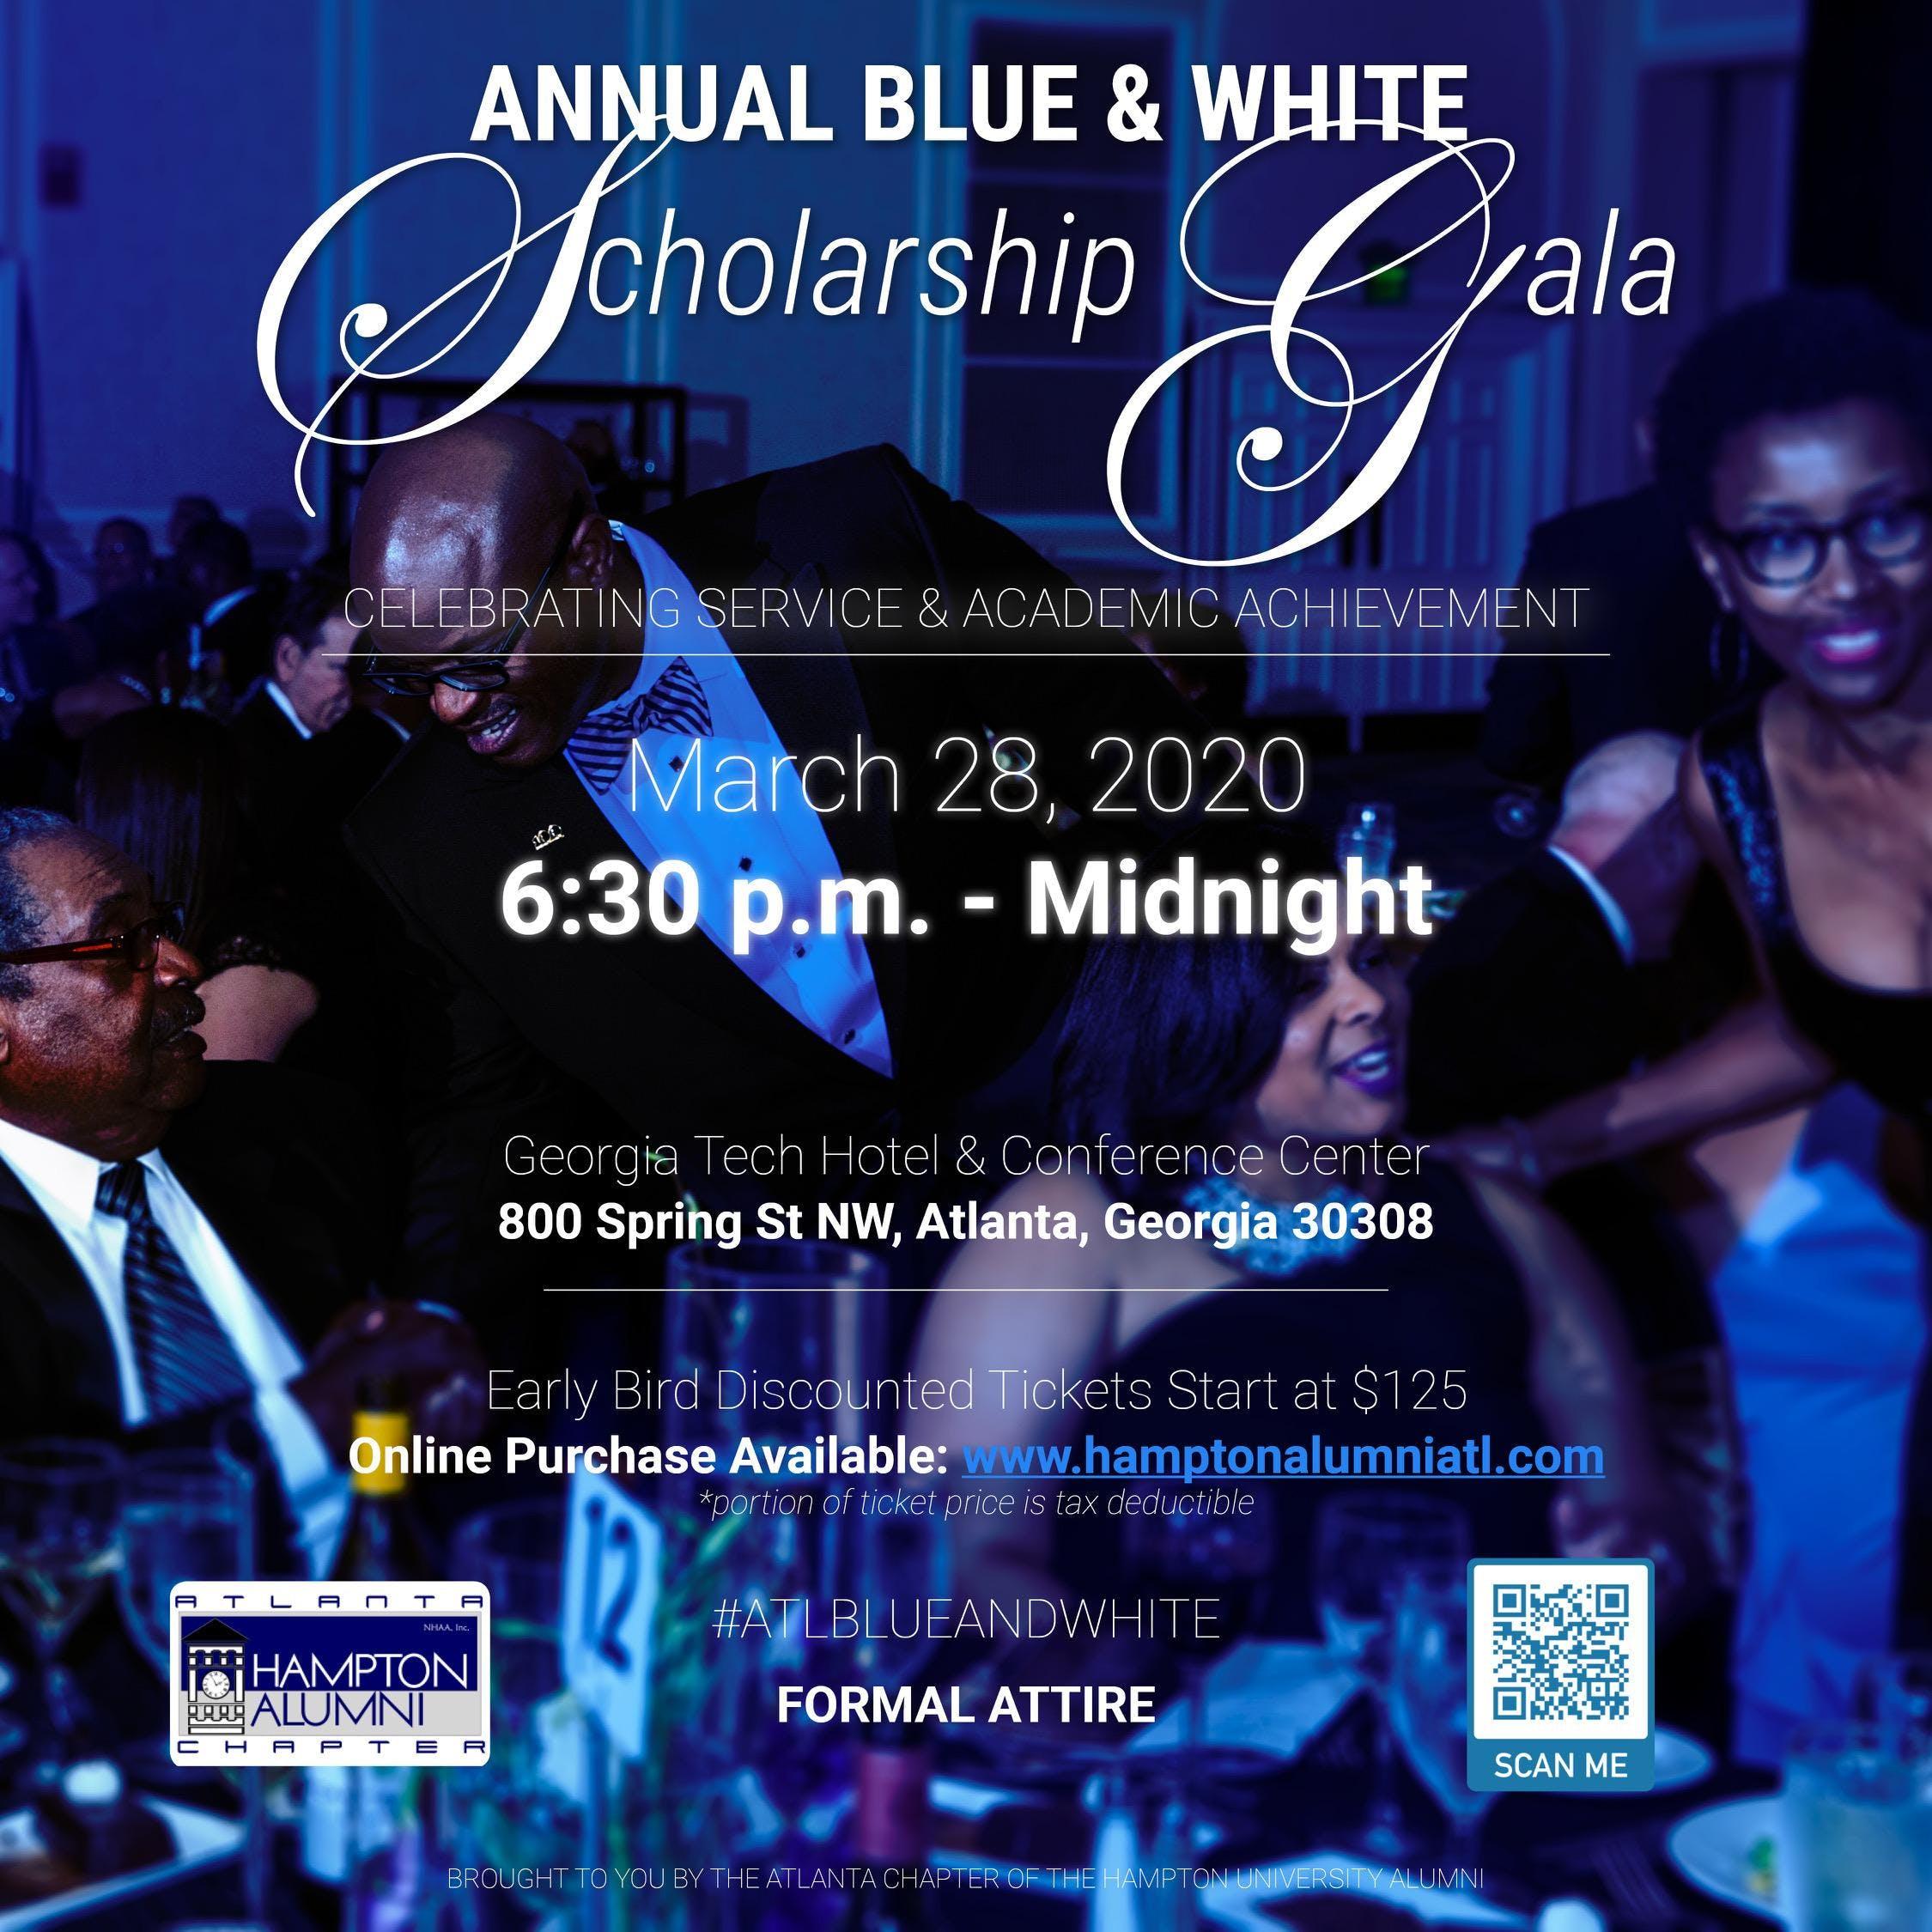 Georgia Current Events 2020.Hampton Alumni Atlanta Annual Blue White Scholarship Gala